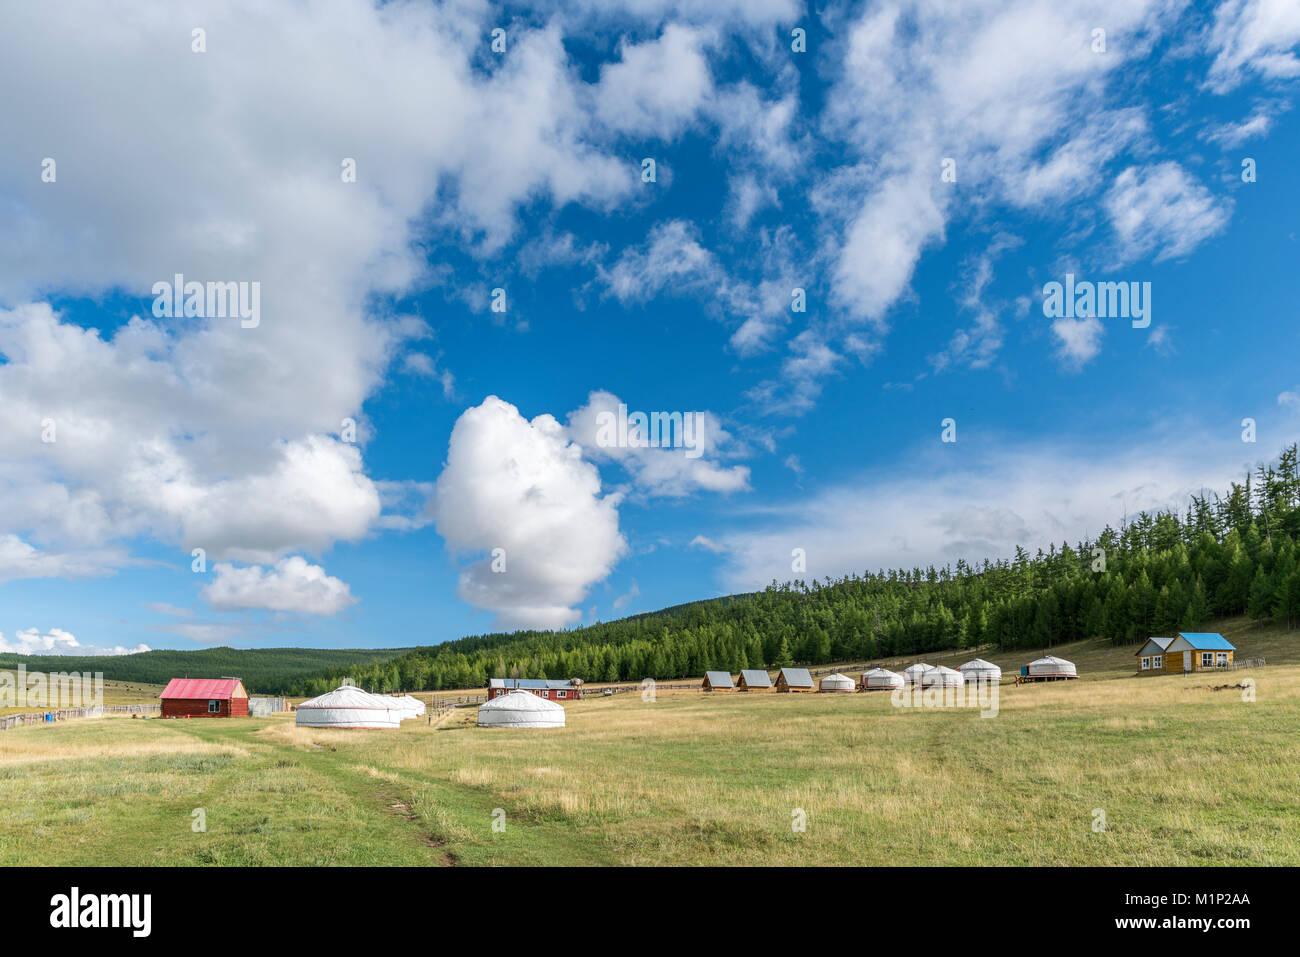 Touristische Ger camp, Burentogtokh Bezirk, Provinz Hovsgol, Mongolei, Zentralasien, Asien Stockbild